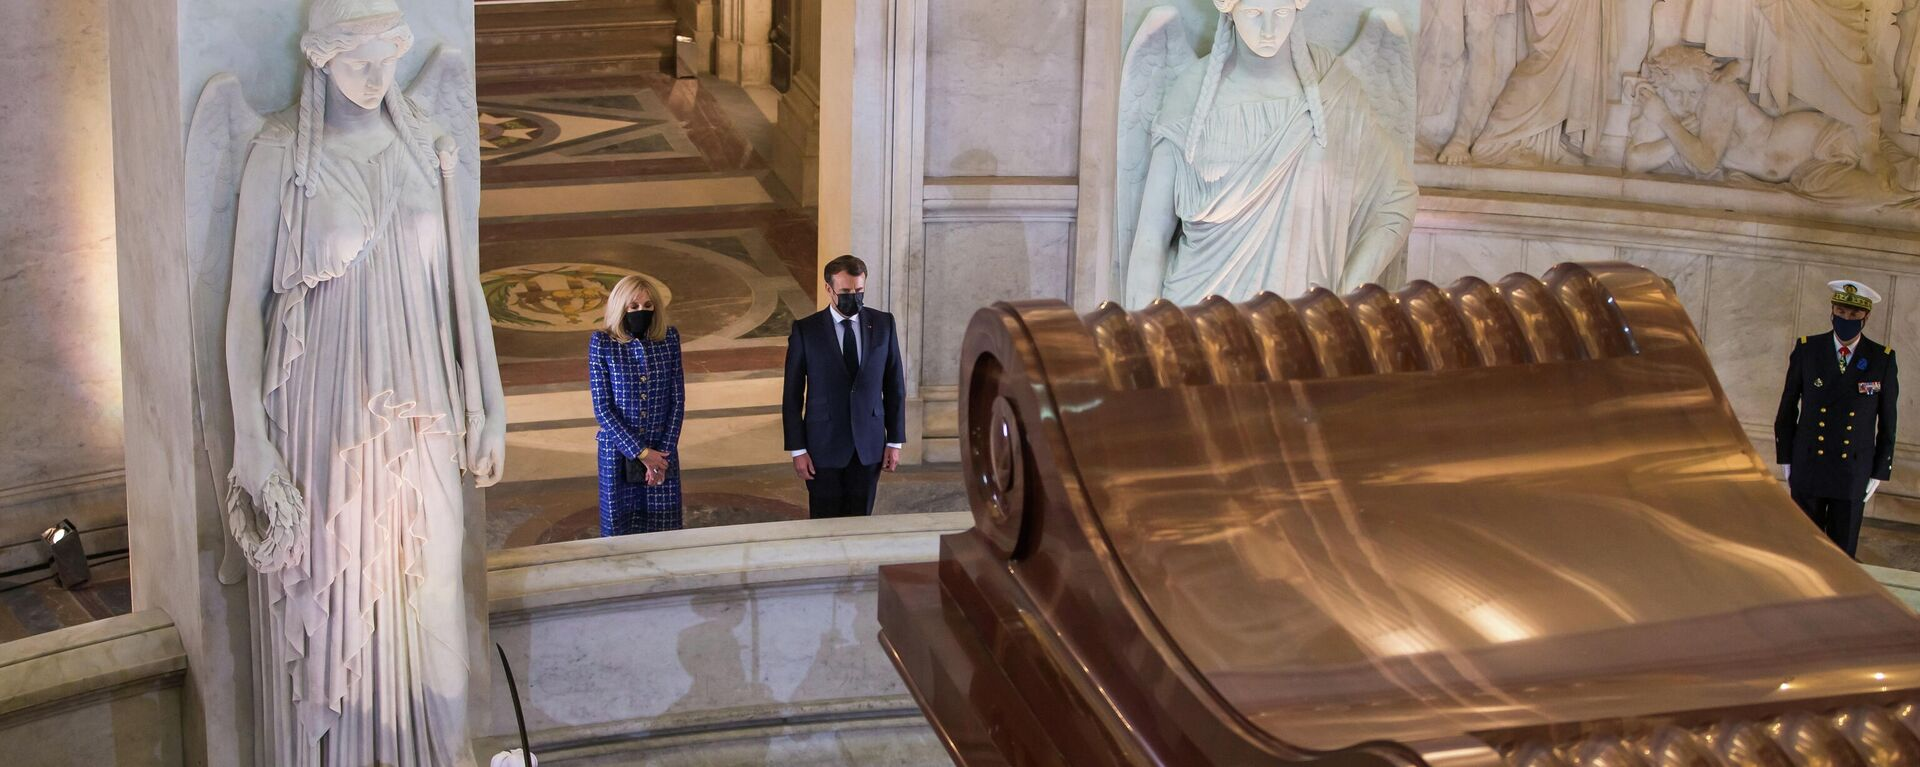 El presidente francés, Emmanuel Macron, frente a la tumba de Napoleón - Sputnik Mundo, 1920, 05.05.2021